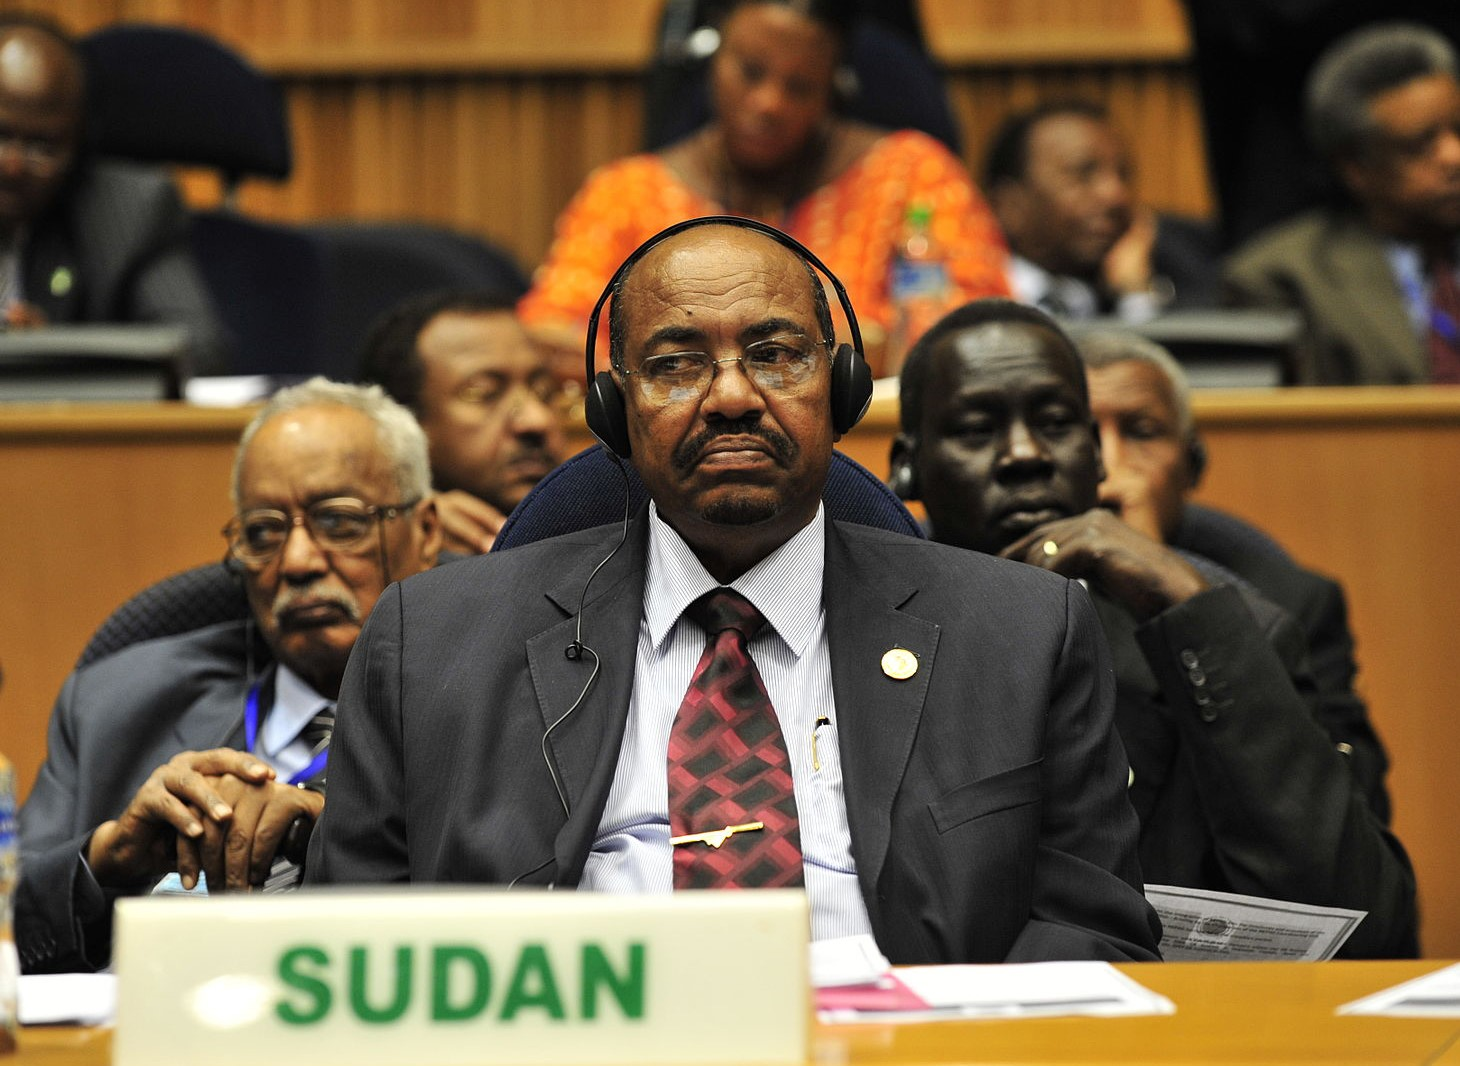 vom, sudan, omar al-bashir